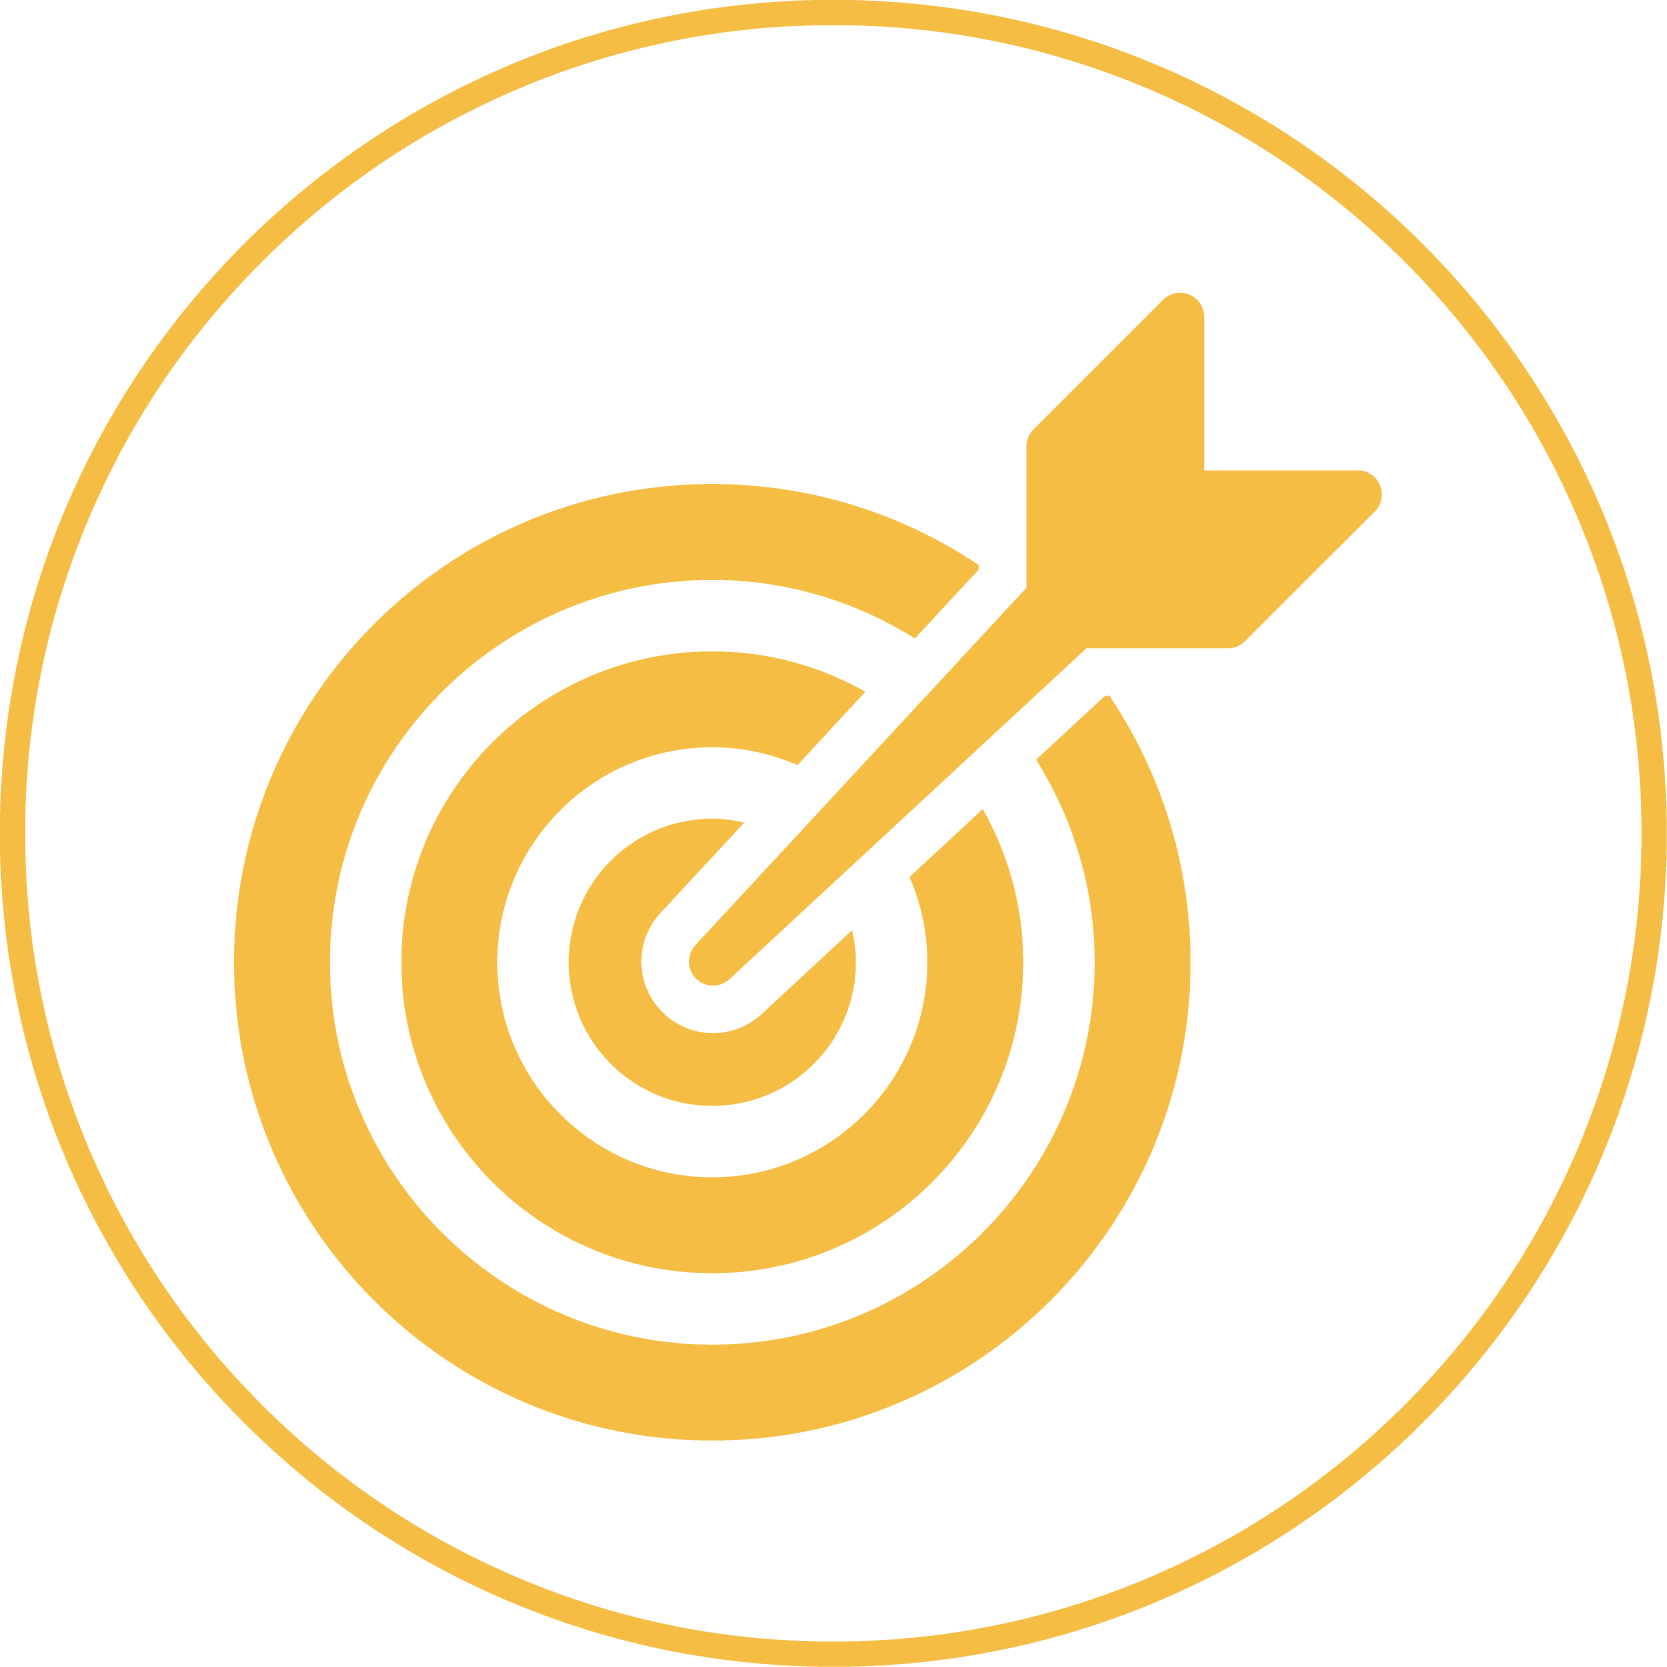 Goal-Directed_Behavior_CMYK